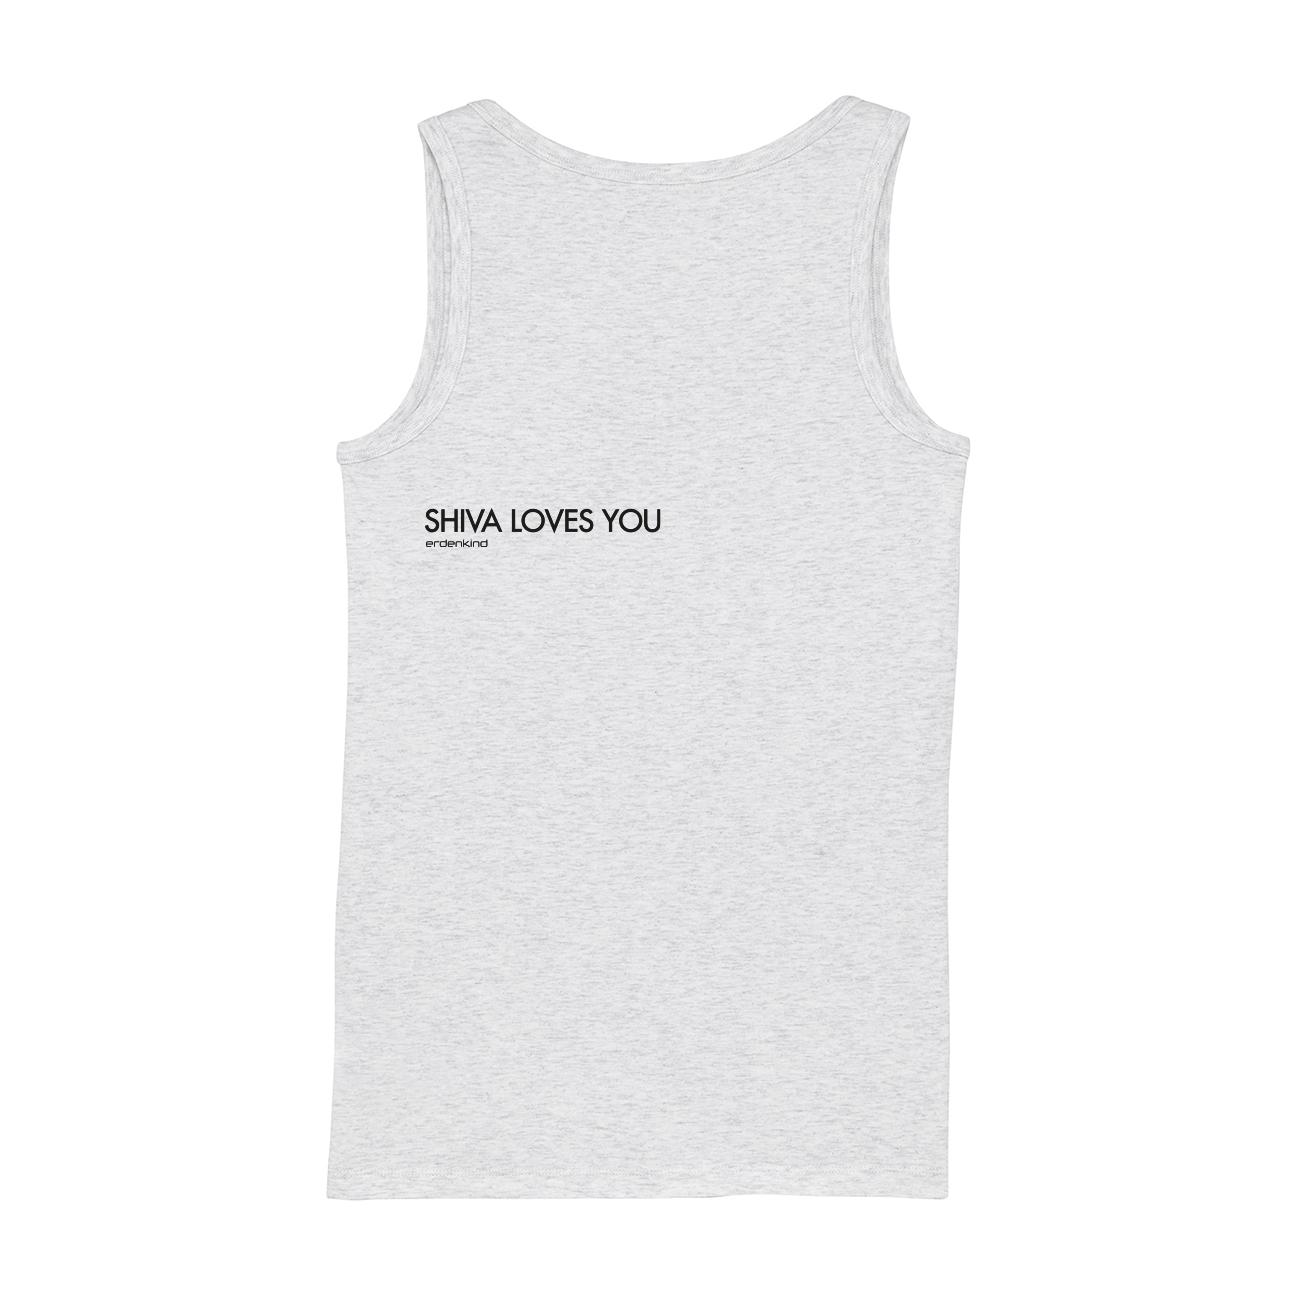 Erdenkind / SHIVA Tank Top - nachhaltige Yoga Bekleidung